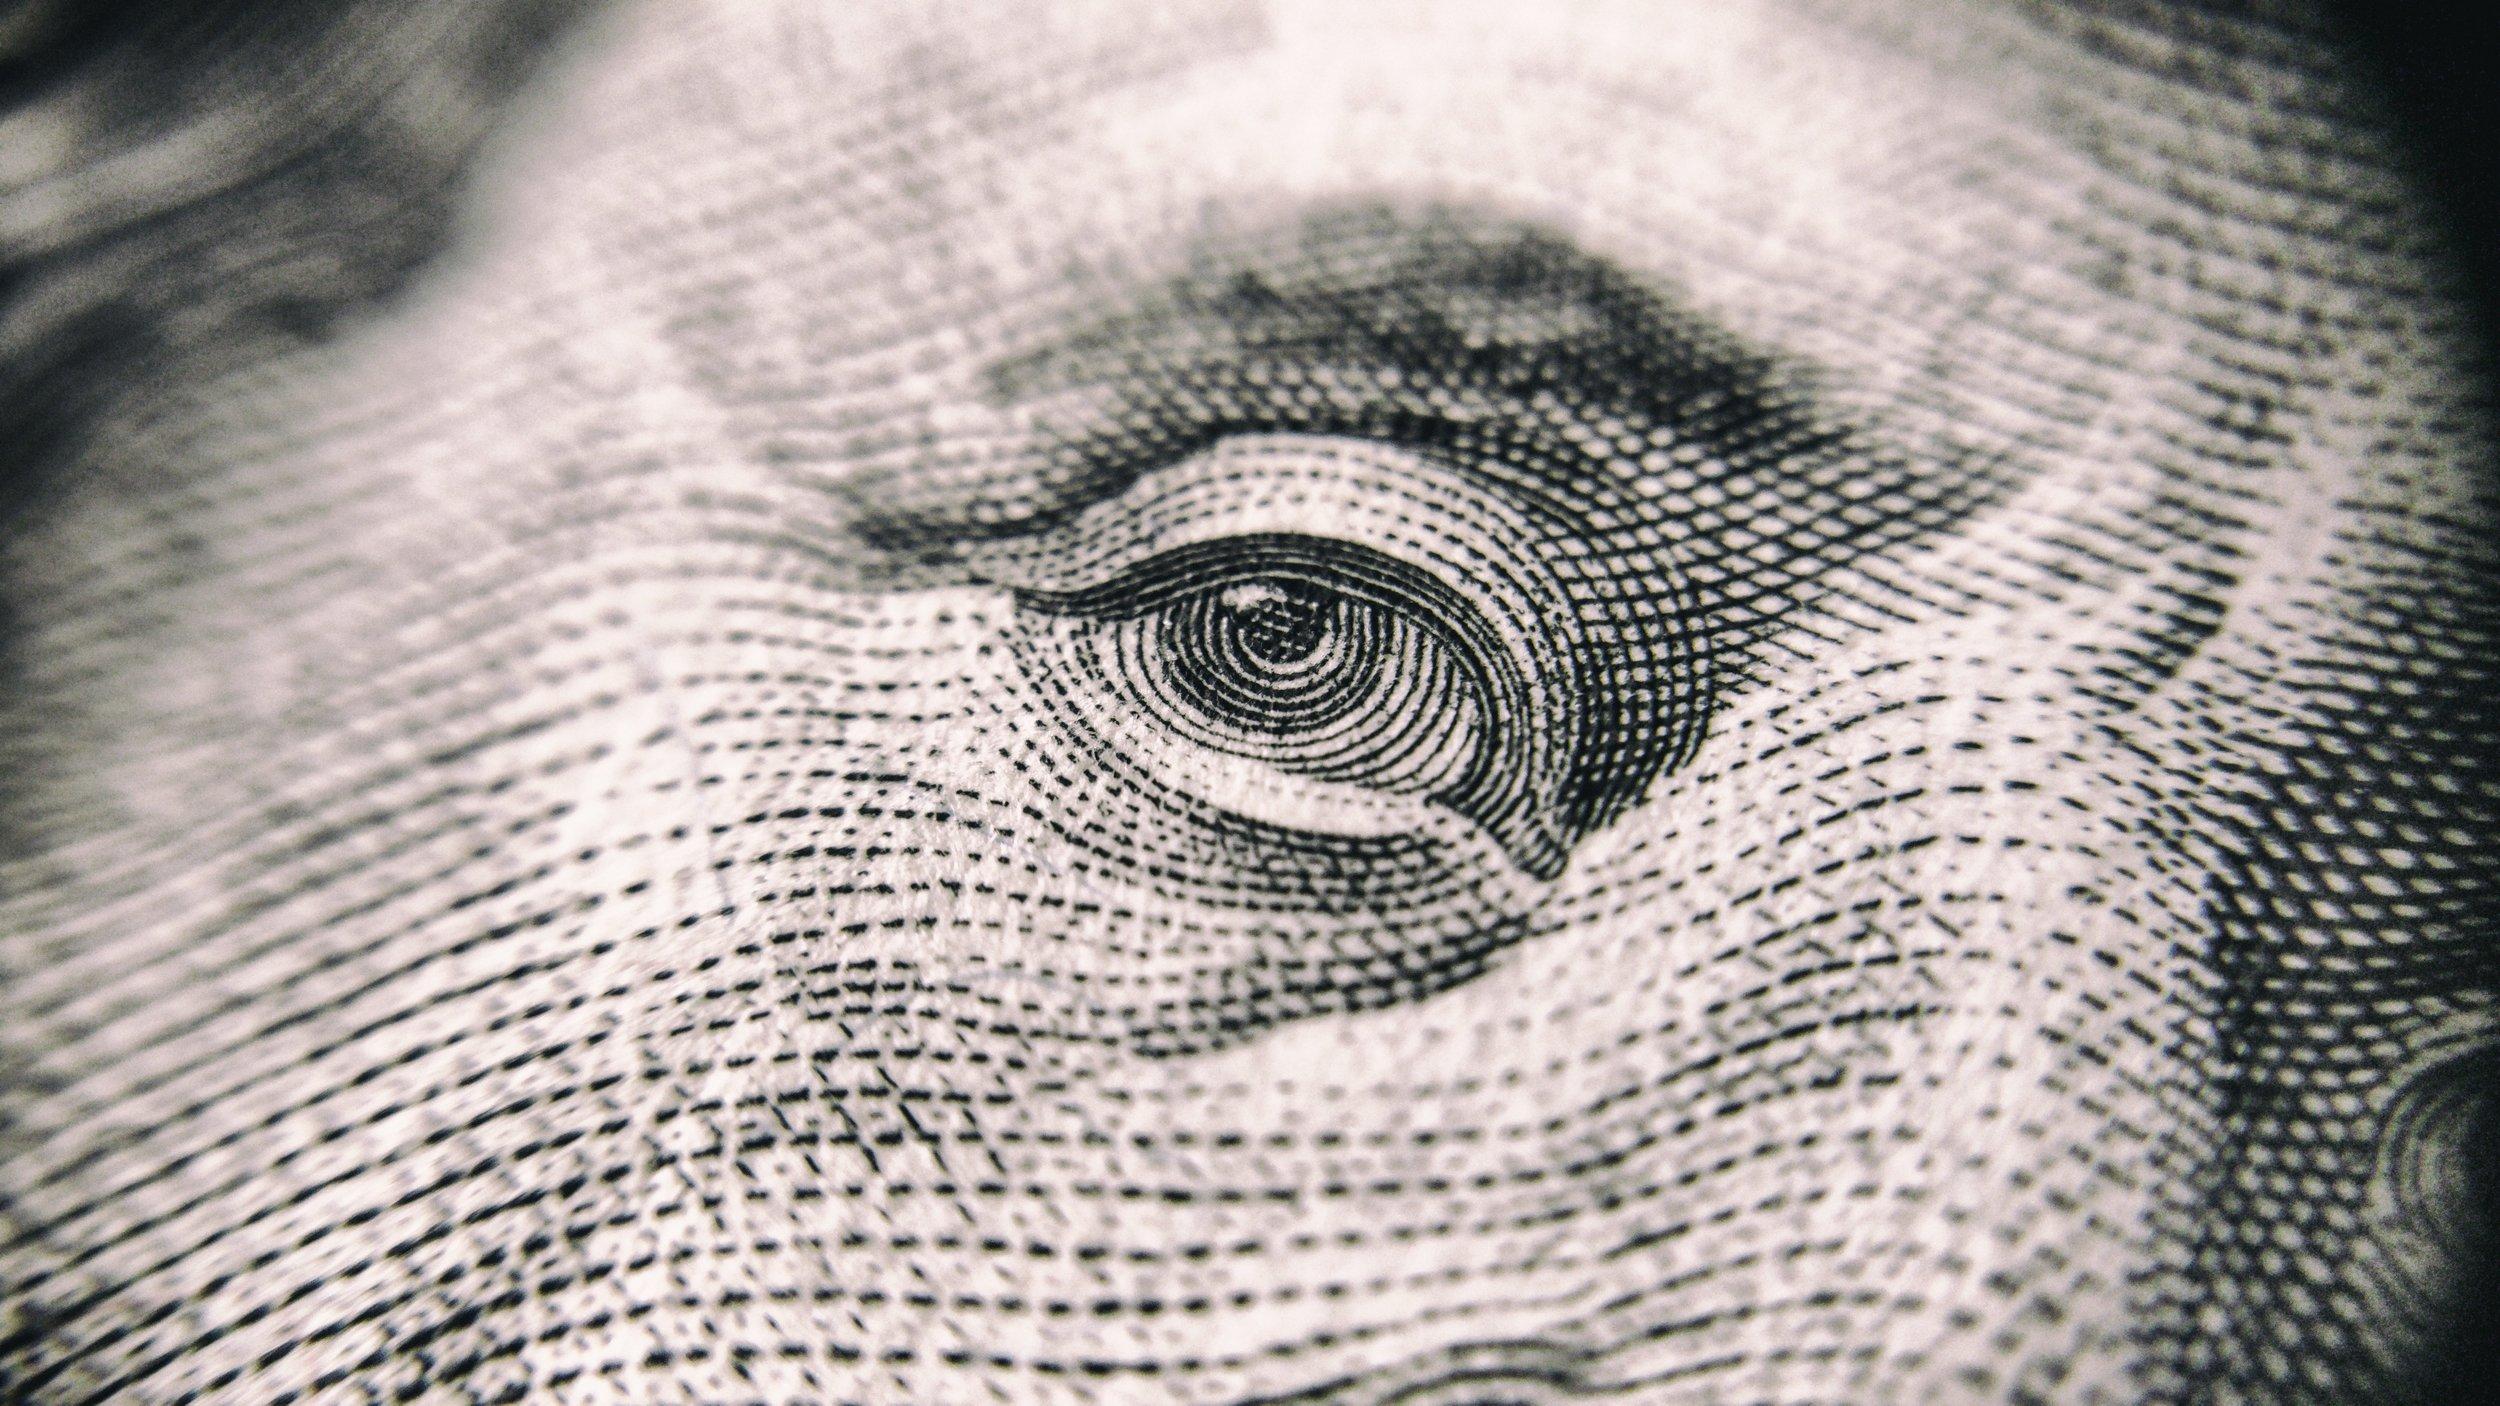 CEVOH has an Exclusive Focus on Revenue Growth